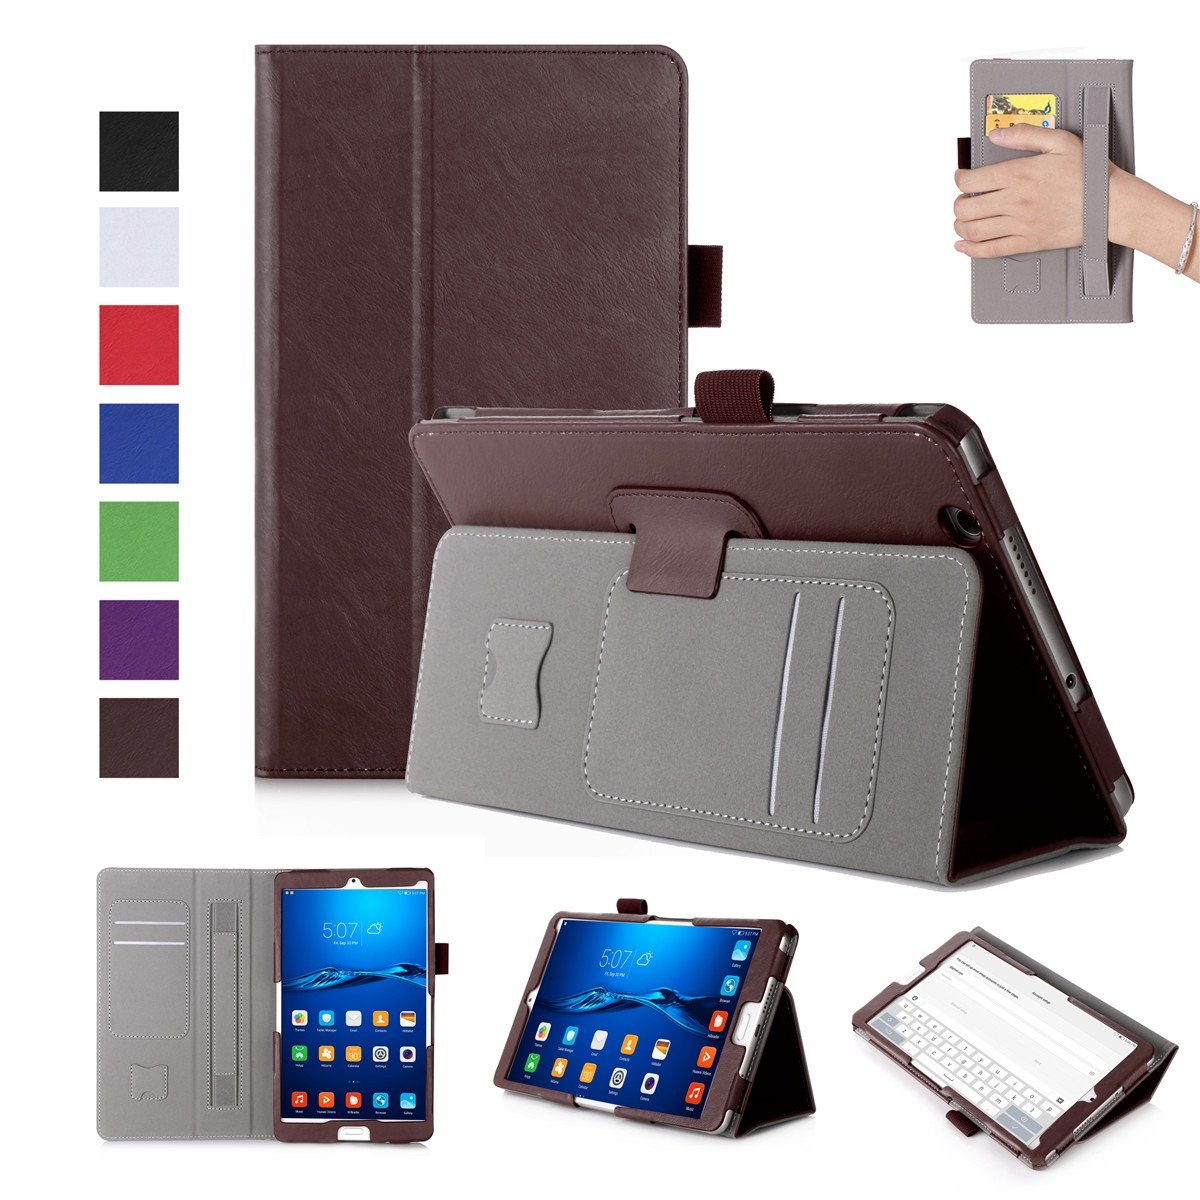 Huawei MediaPad M3 8.4インチケース 高級本革ケース スタンド付き フリップカバー ハンドメイド Huawei MediaPad M3 8.4インチ用 ブラウン   B07LCJCVBG